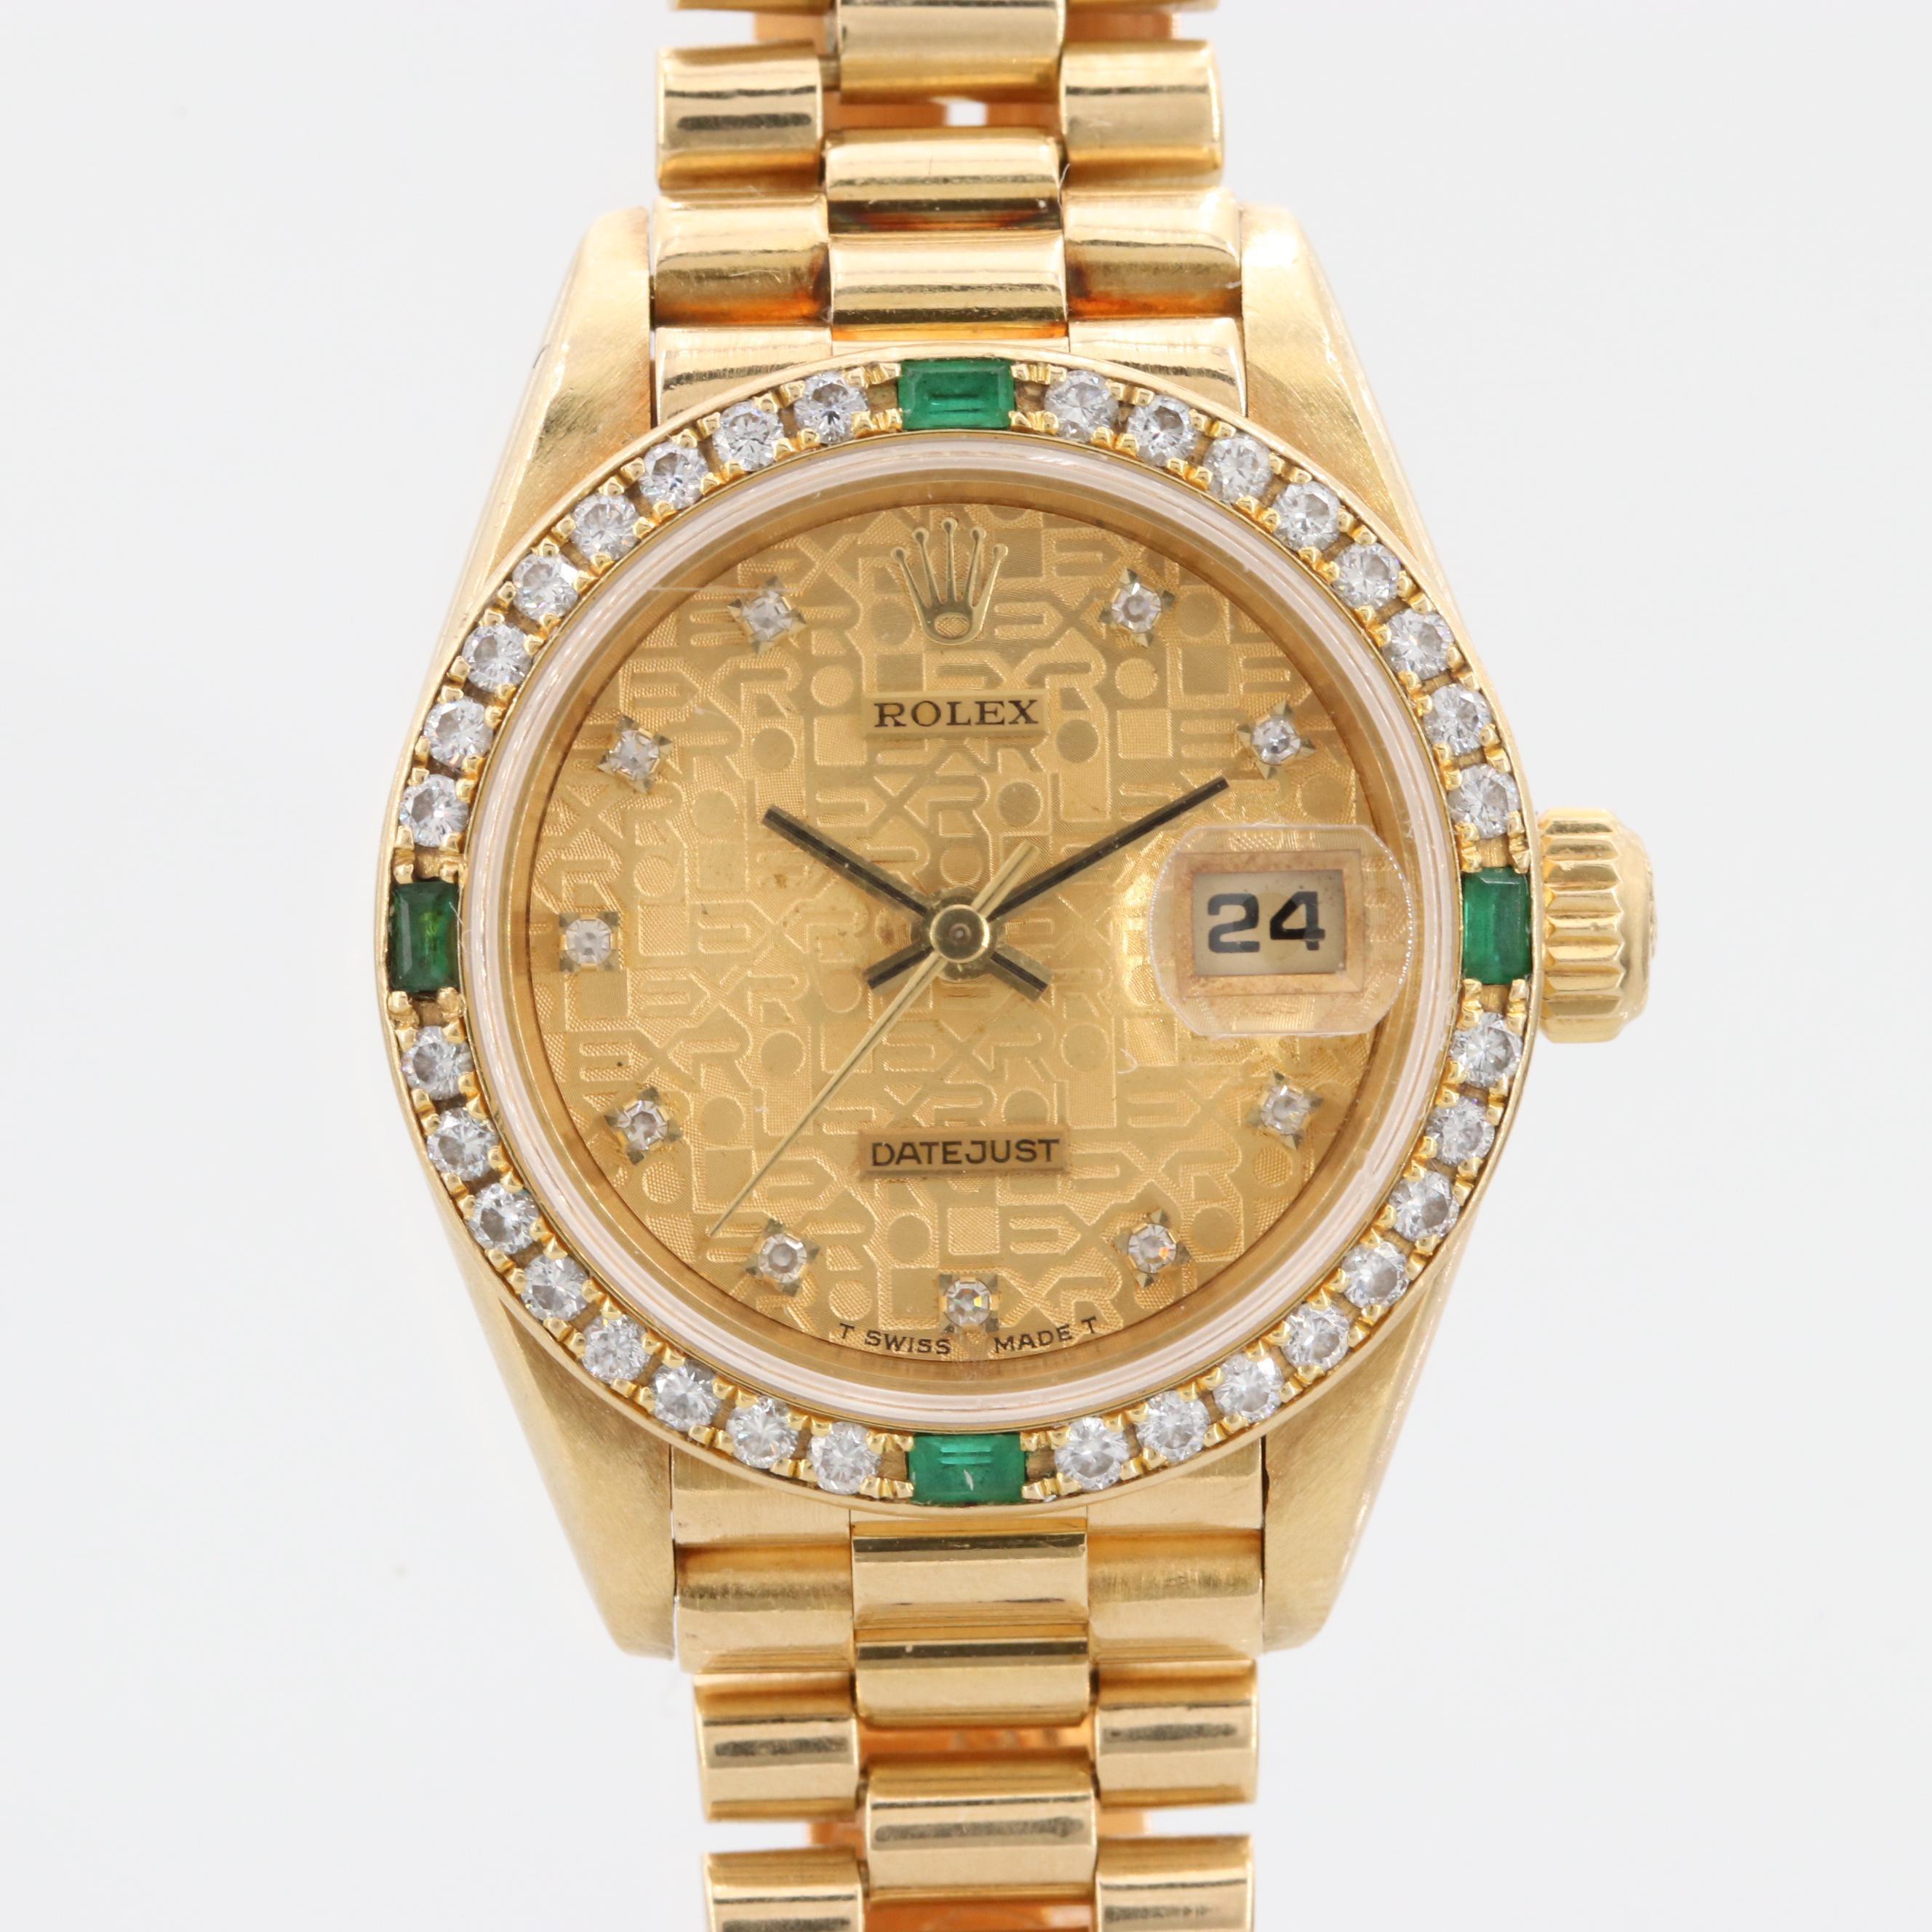 Rolex Datejust 18K Yellow Gold Diamond and Emerald Wristwatch, 1990